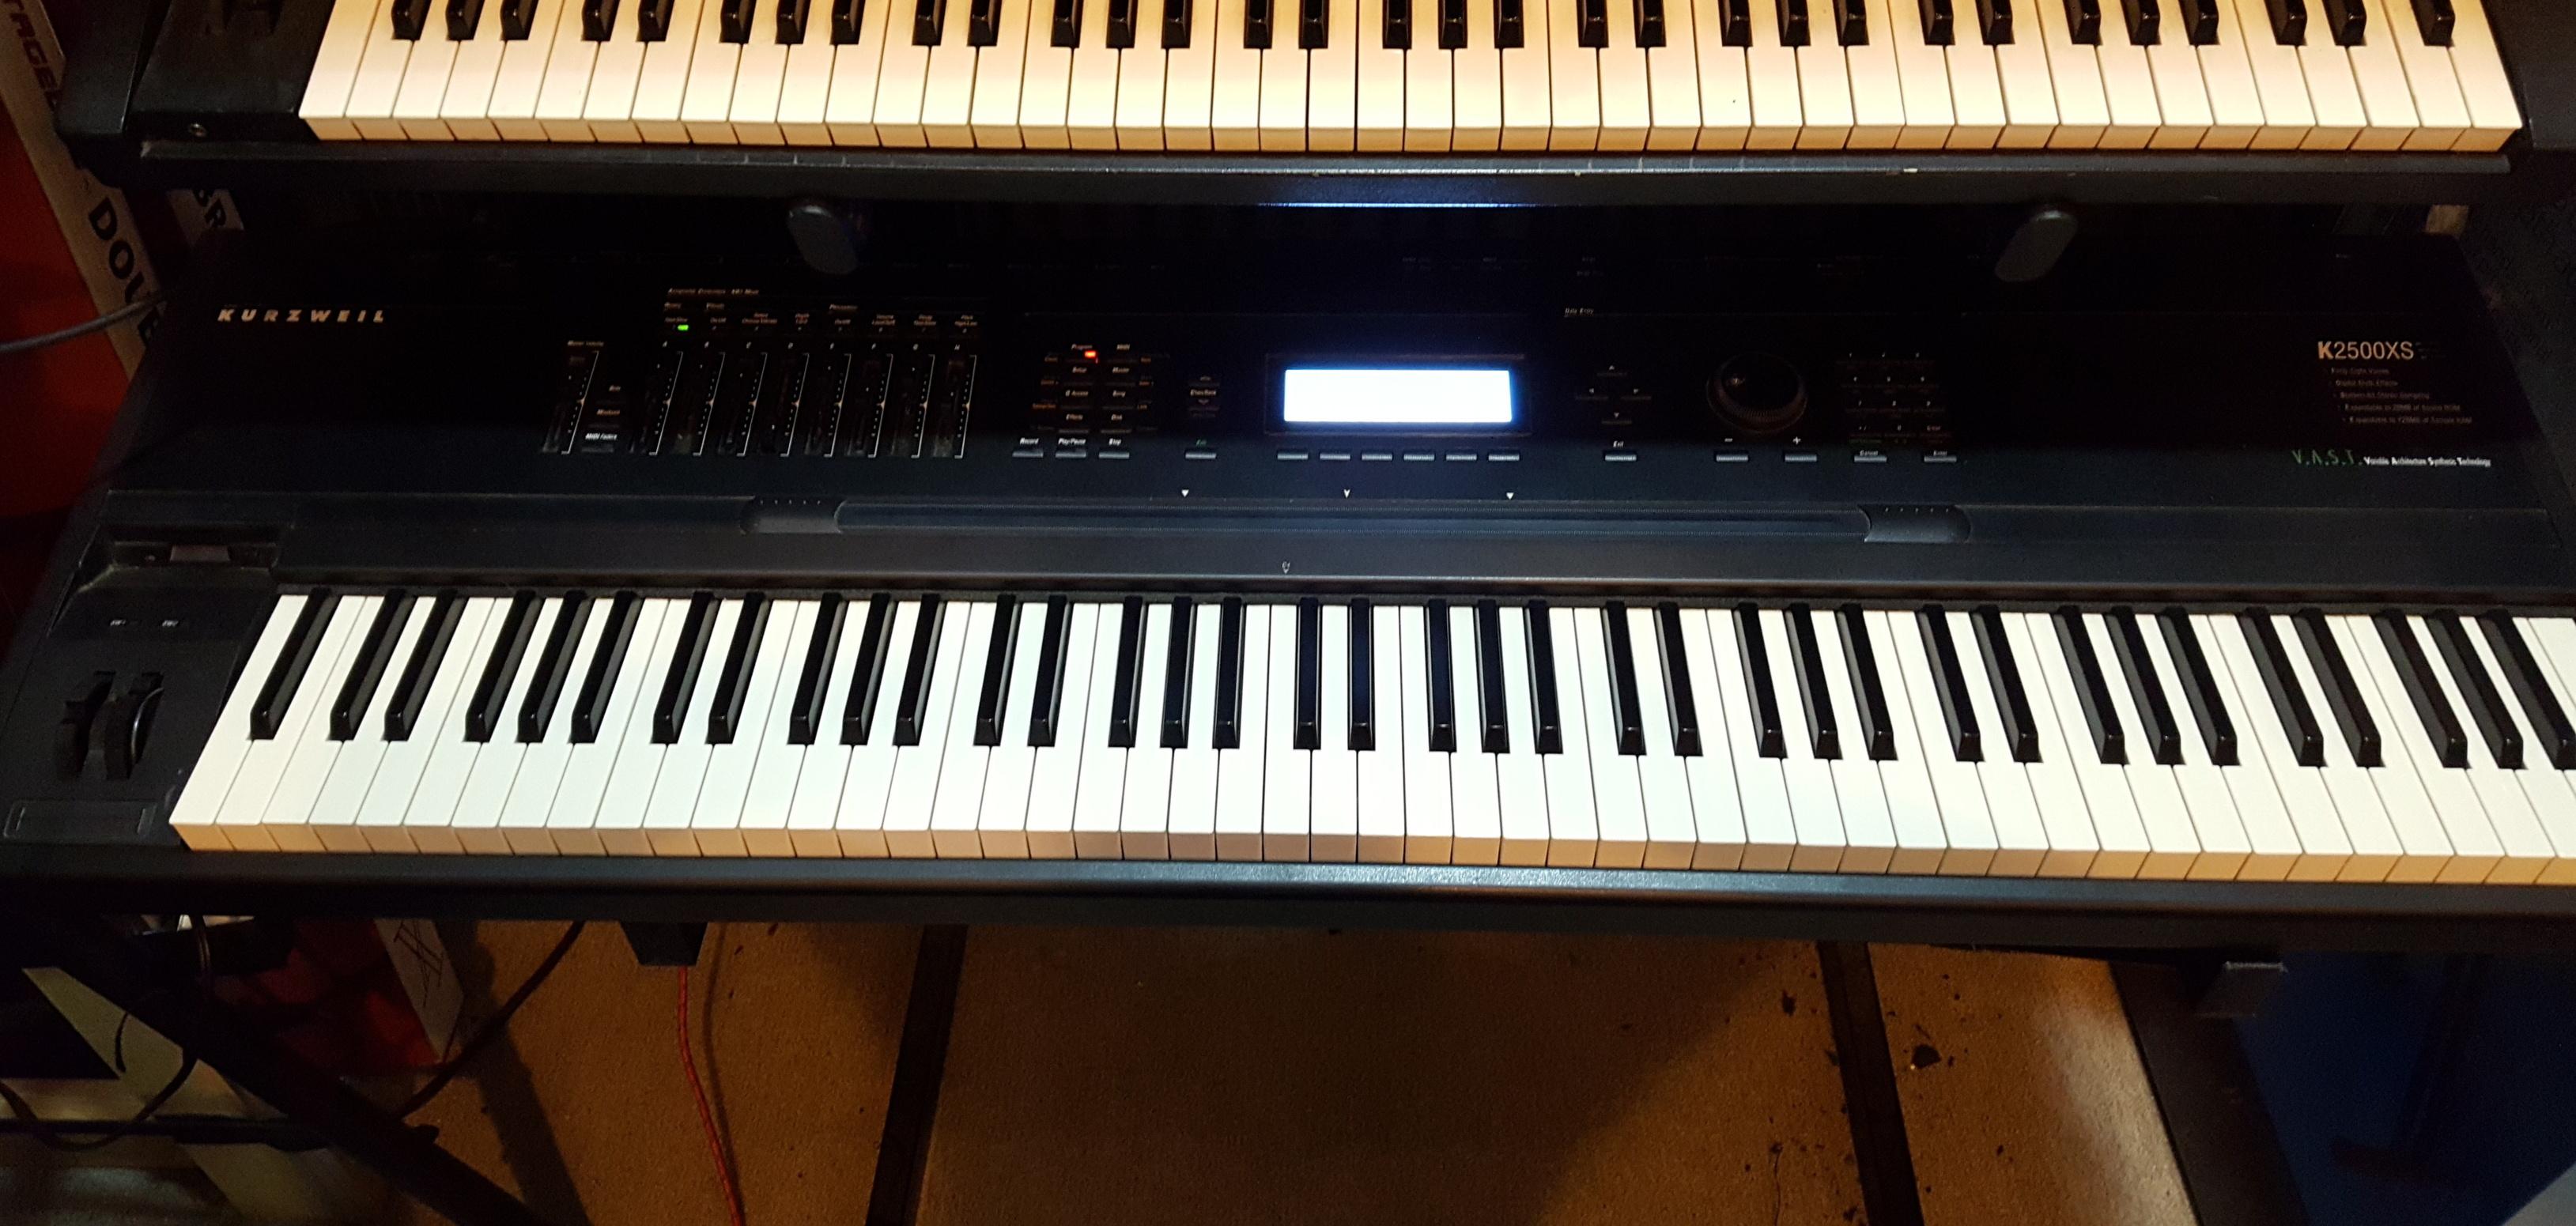 KURZWEIL K2500XS 88-Key Synthesizer/Sampler/Workstation **LOCAL PICKUP ONLY**